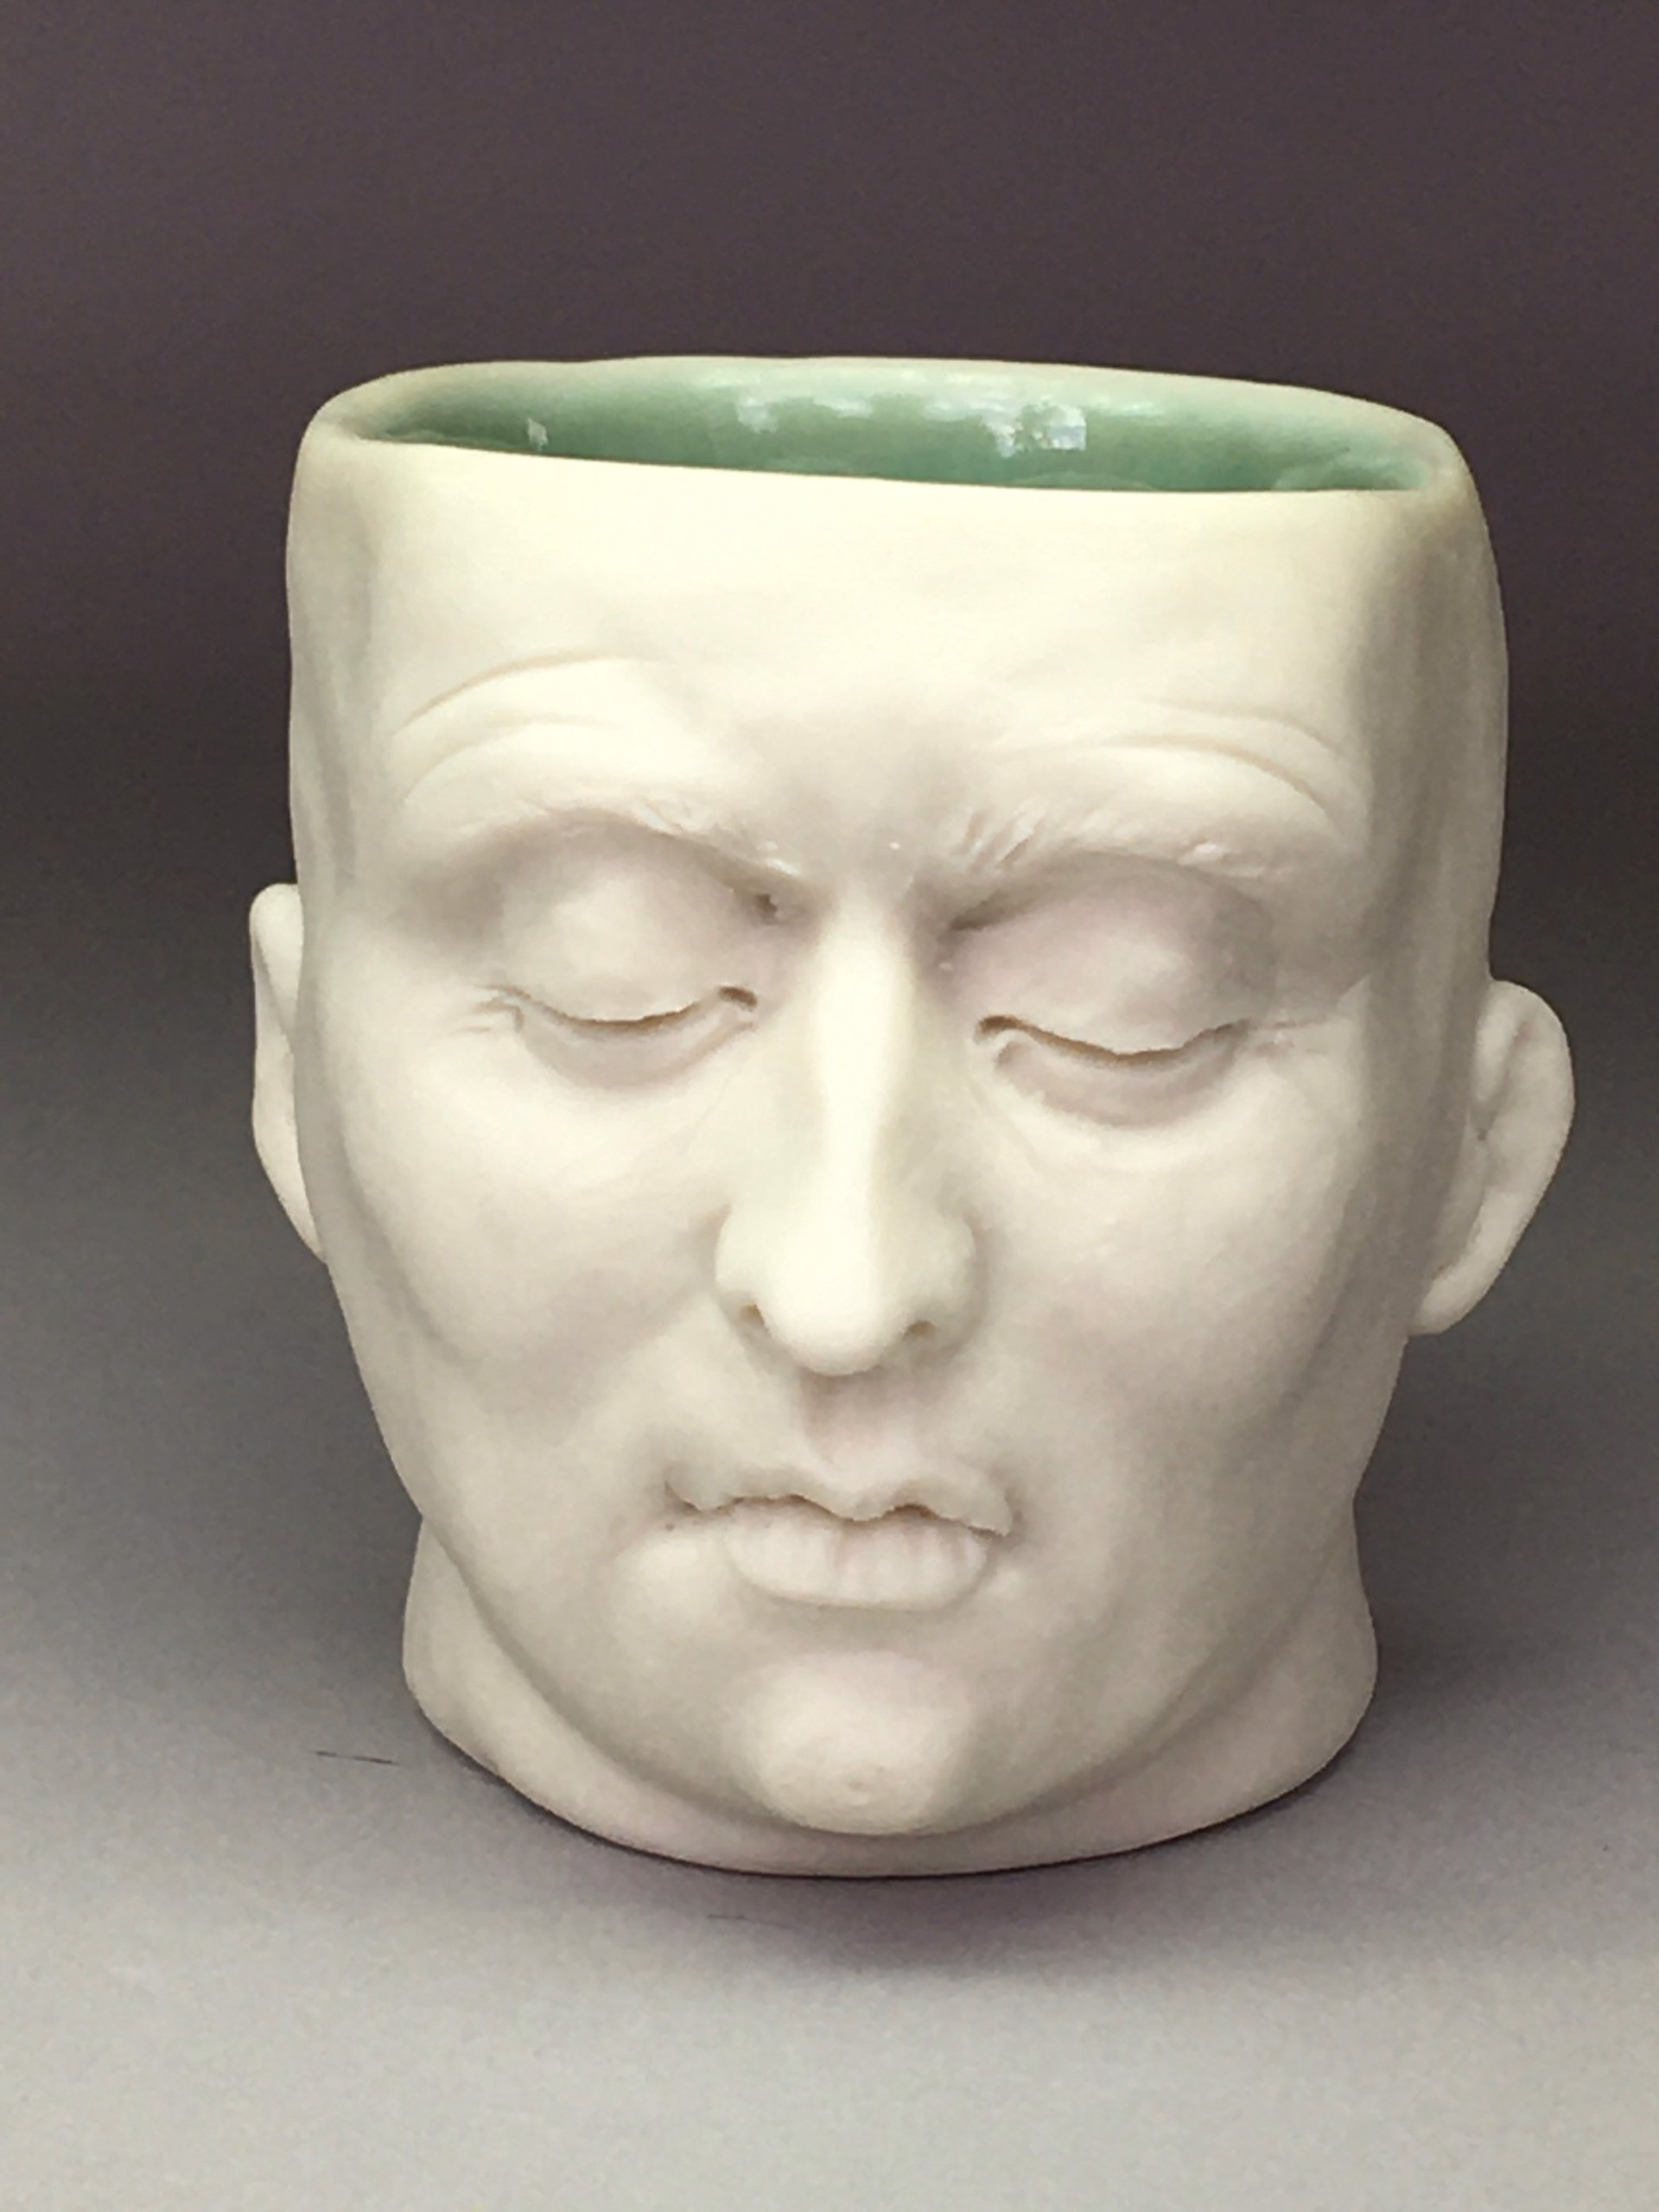 """Concerned Friend Shot Glass I"" (dark green interior, closed eyes) by Adrian Arleo"